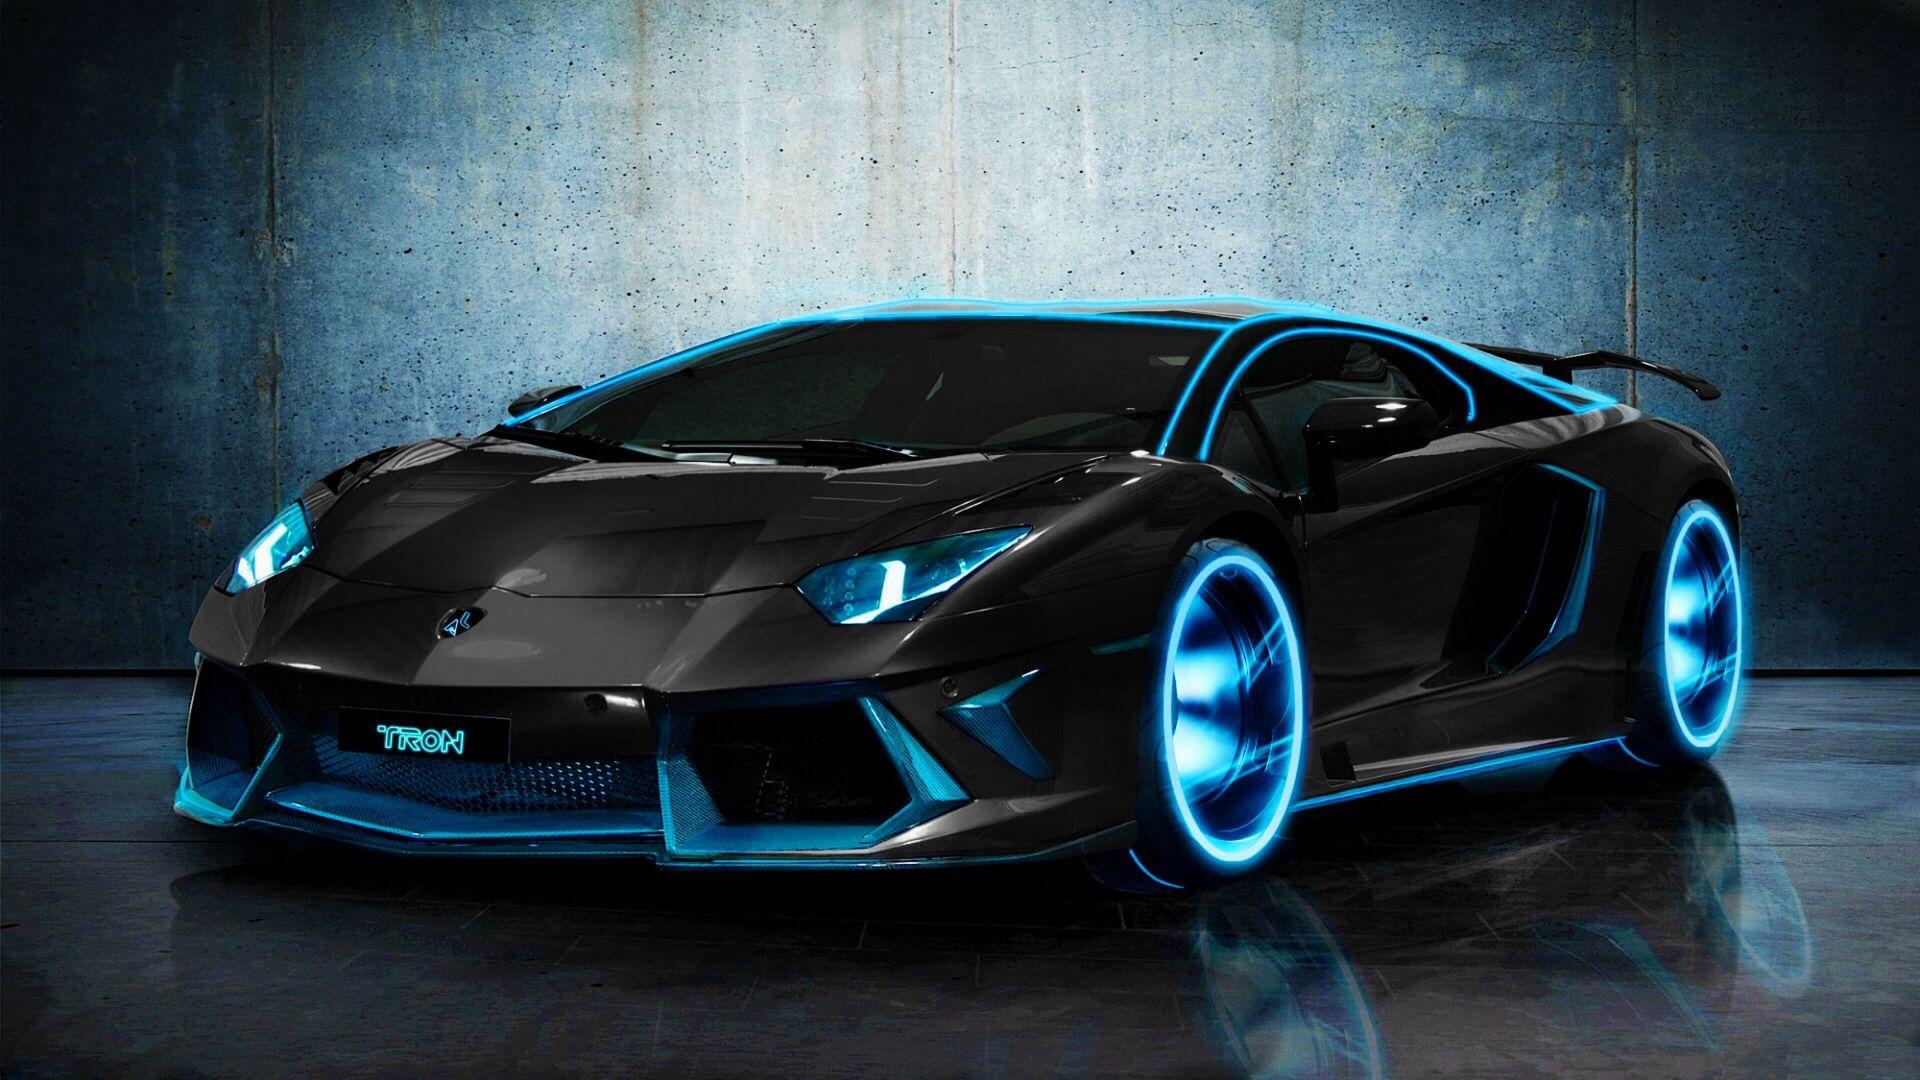 Tron Styled Lamborghini Aventador I Really Like Learning About Cars